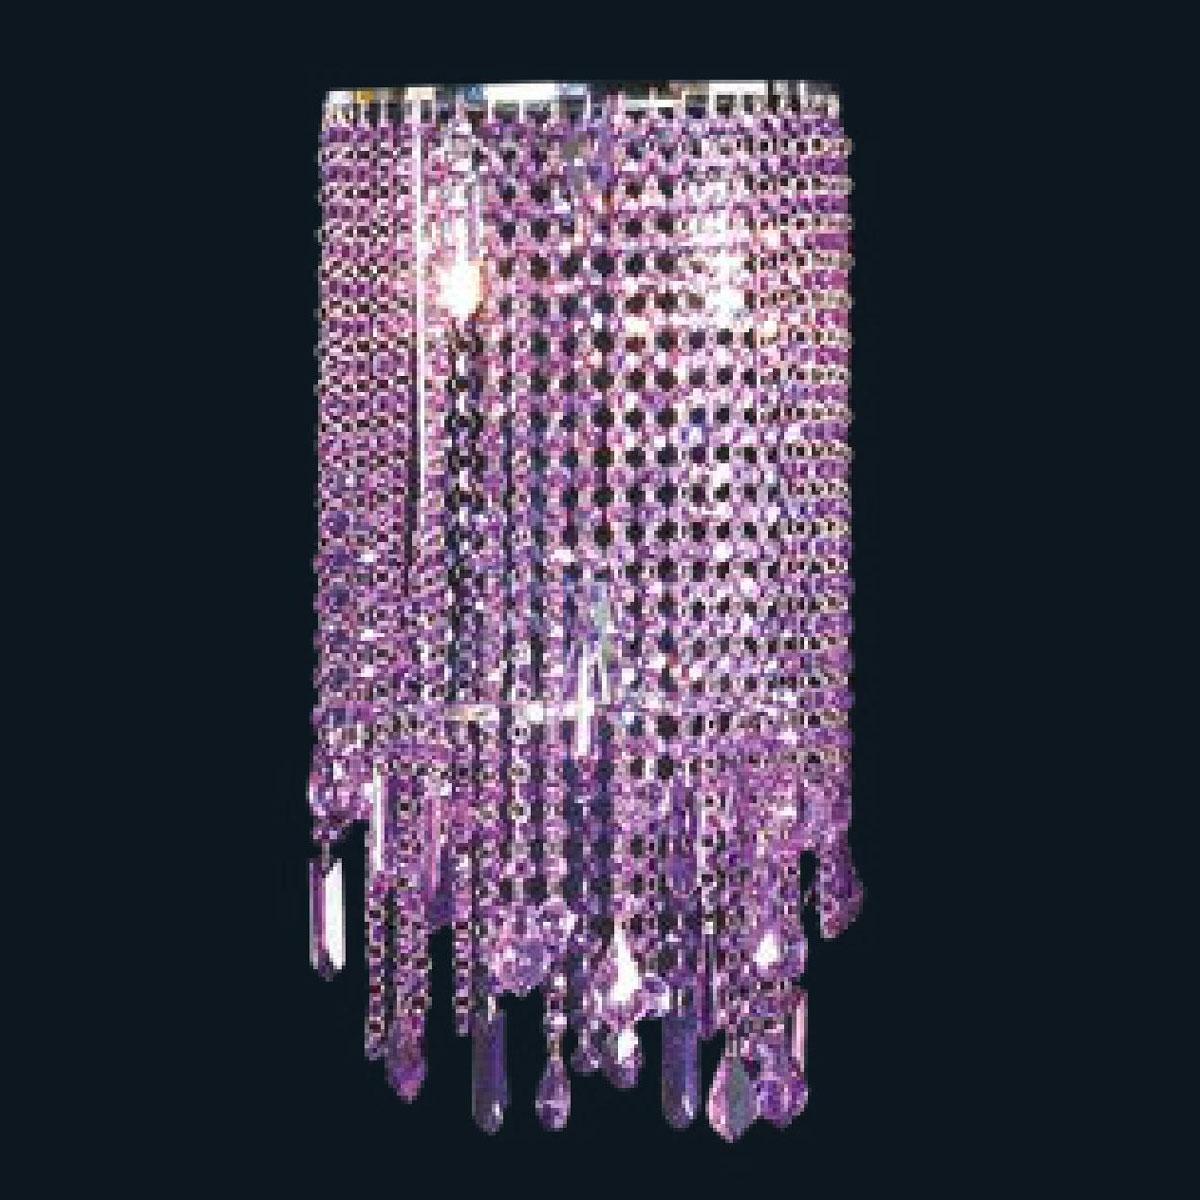 """Maddison"" Murano glass sconce - 2 lights - amethyst"